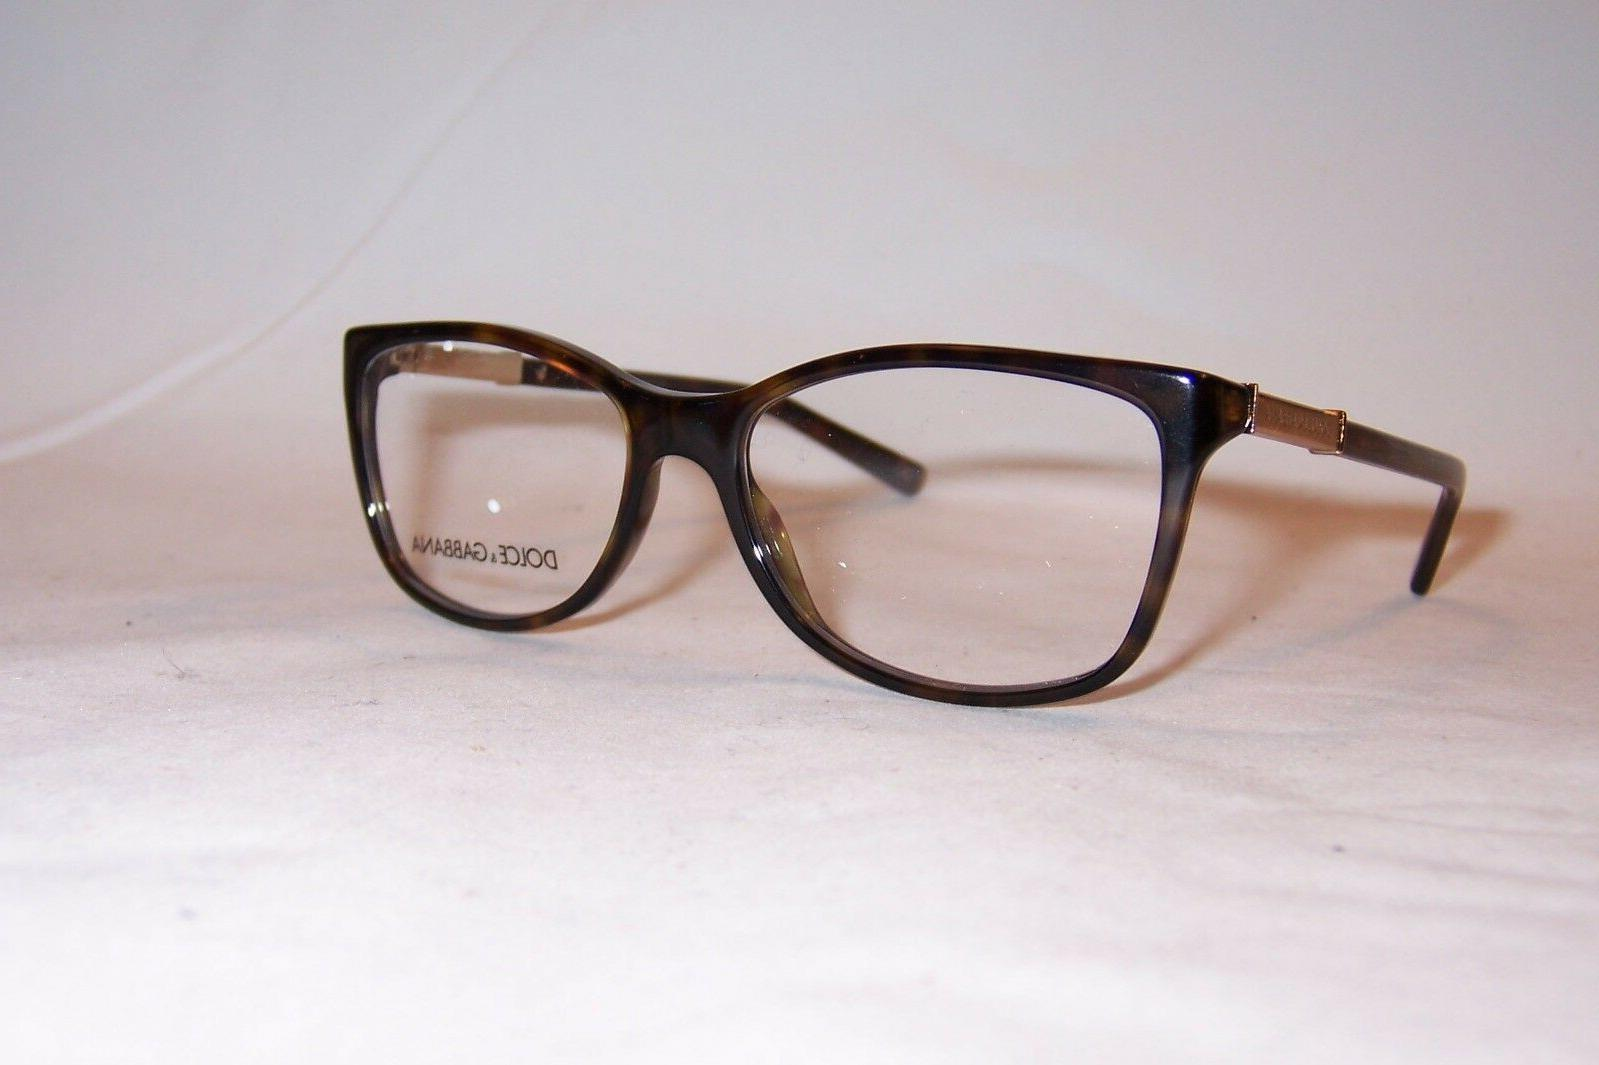 Dolce & Gabbana DG 3107 Logo Plaque Eyeglasses 502 Havana